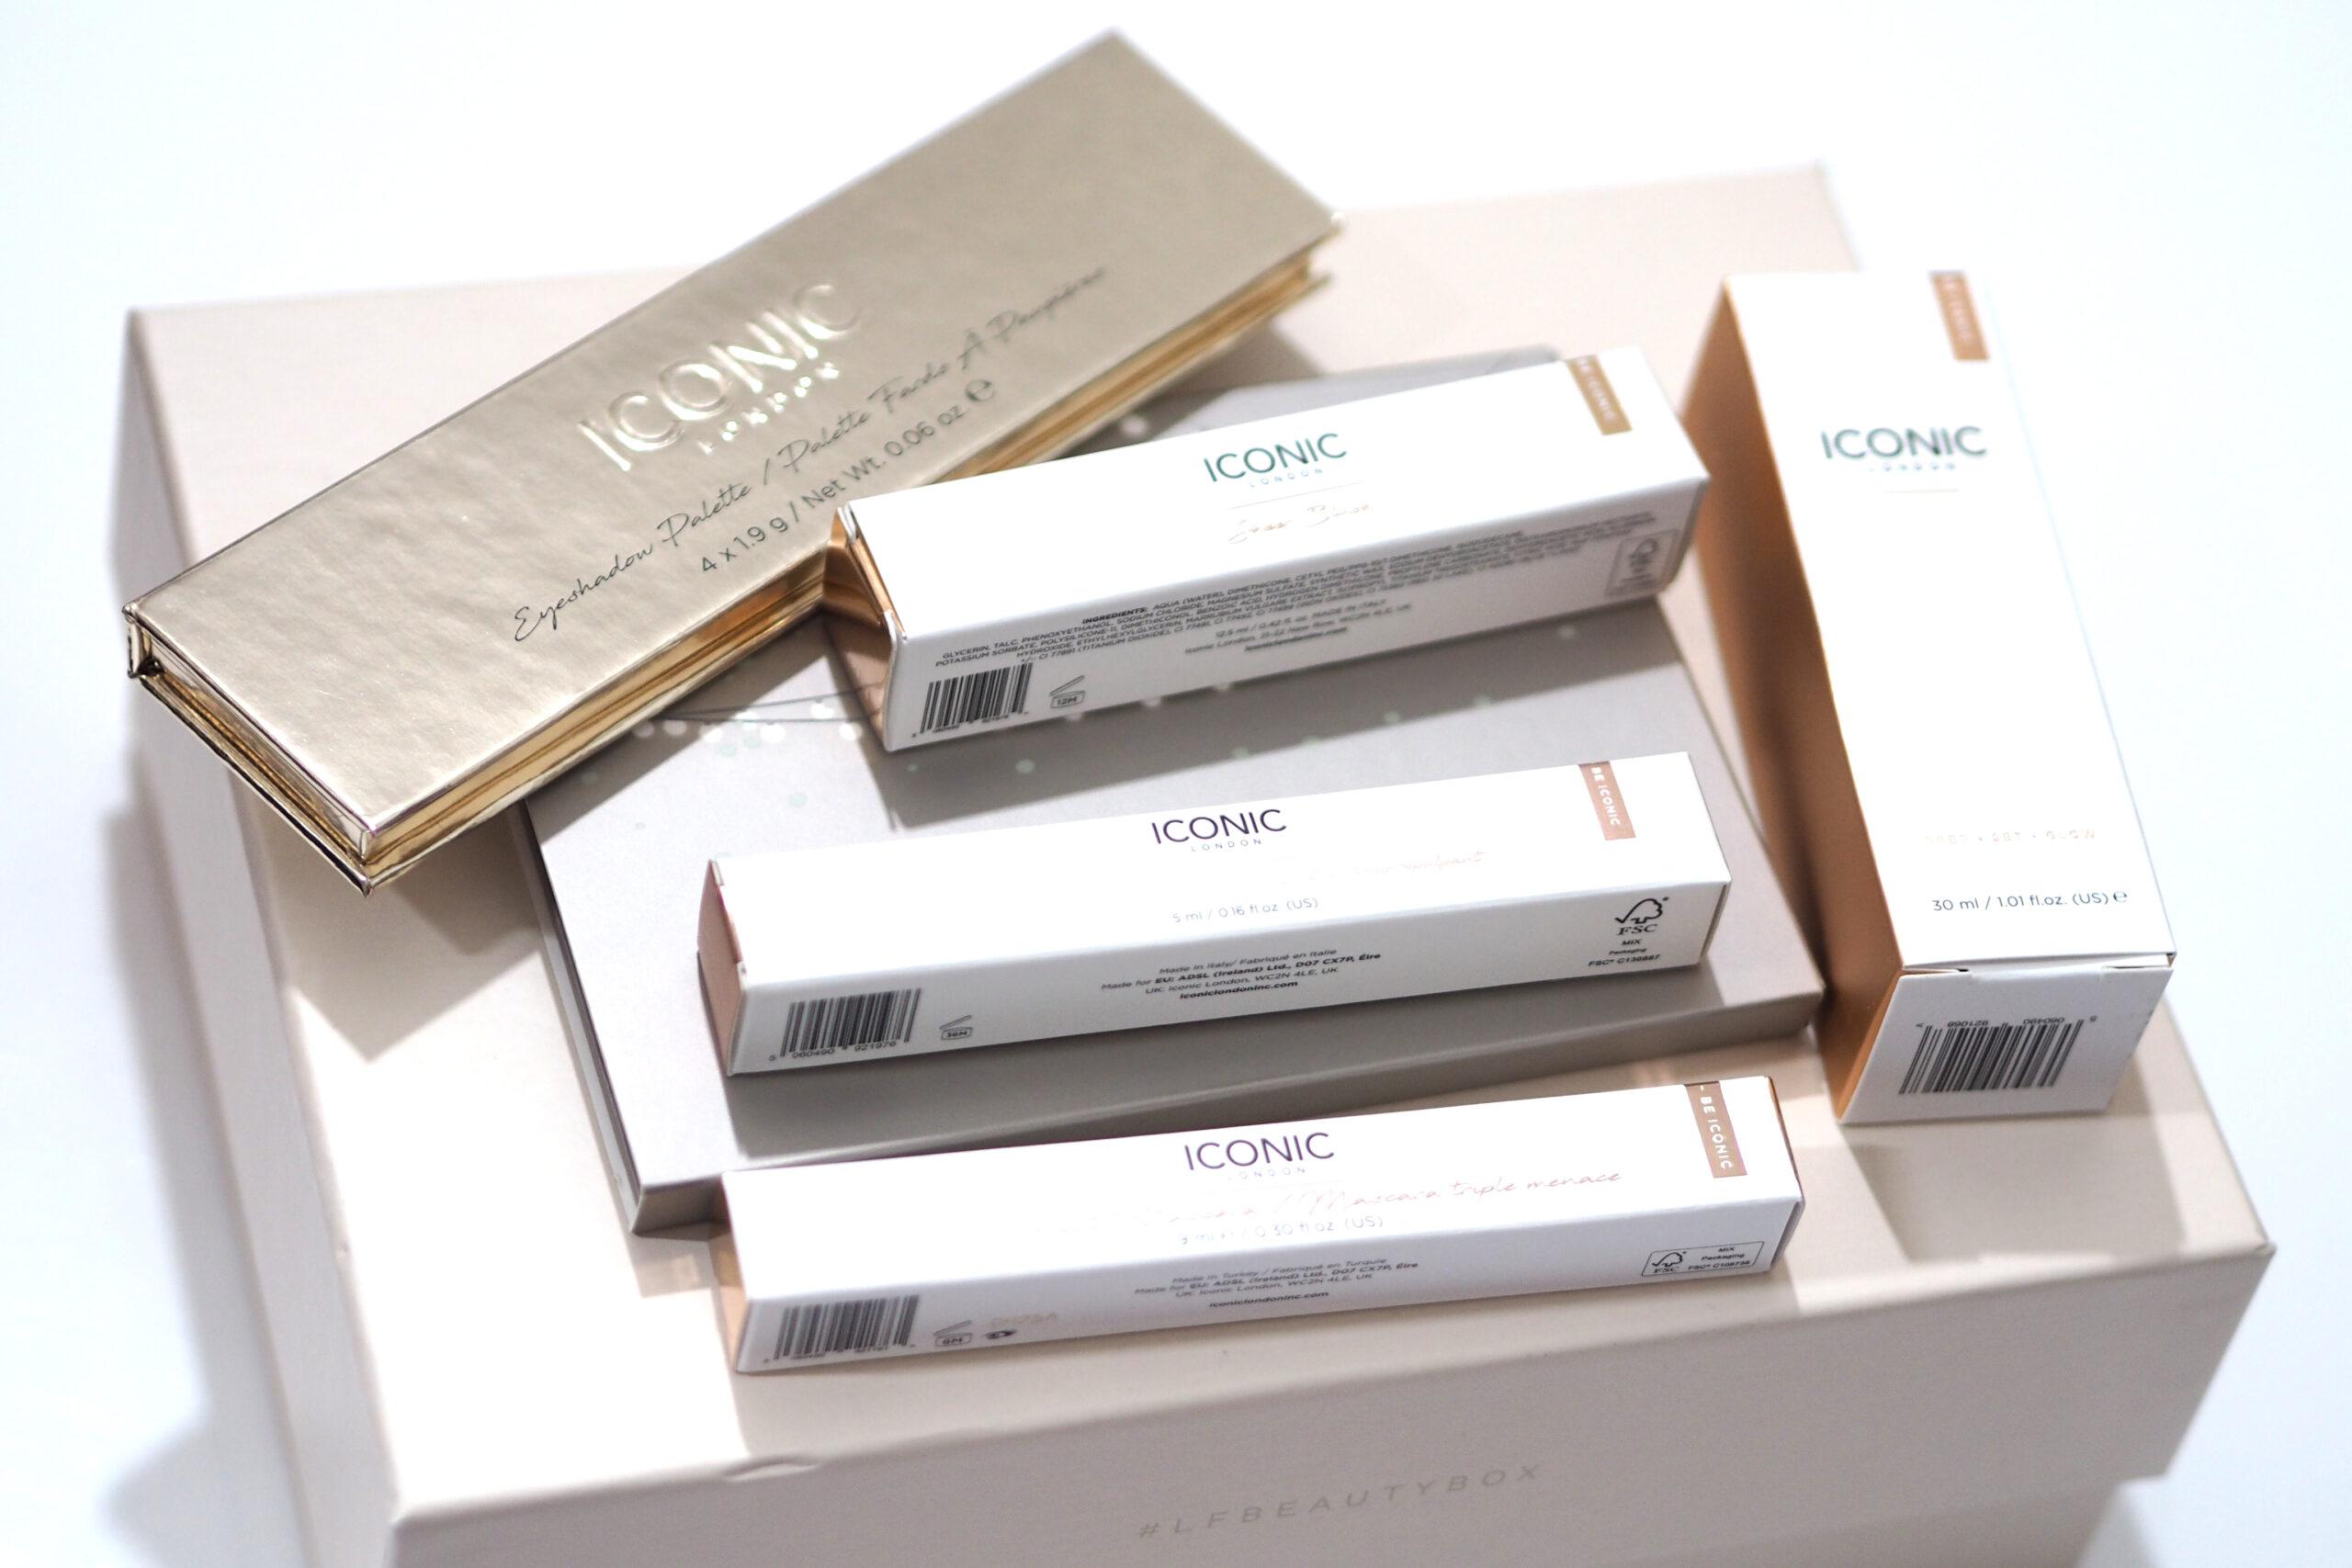 Lookfantastic x Iconic London Beauty Box Reveal! 2